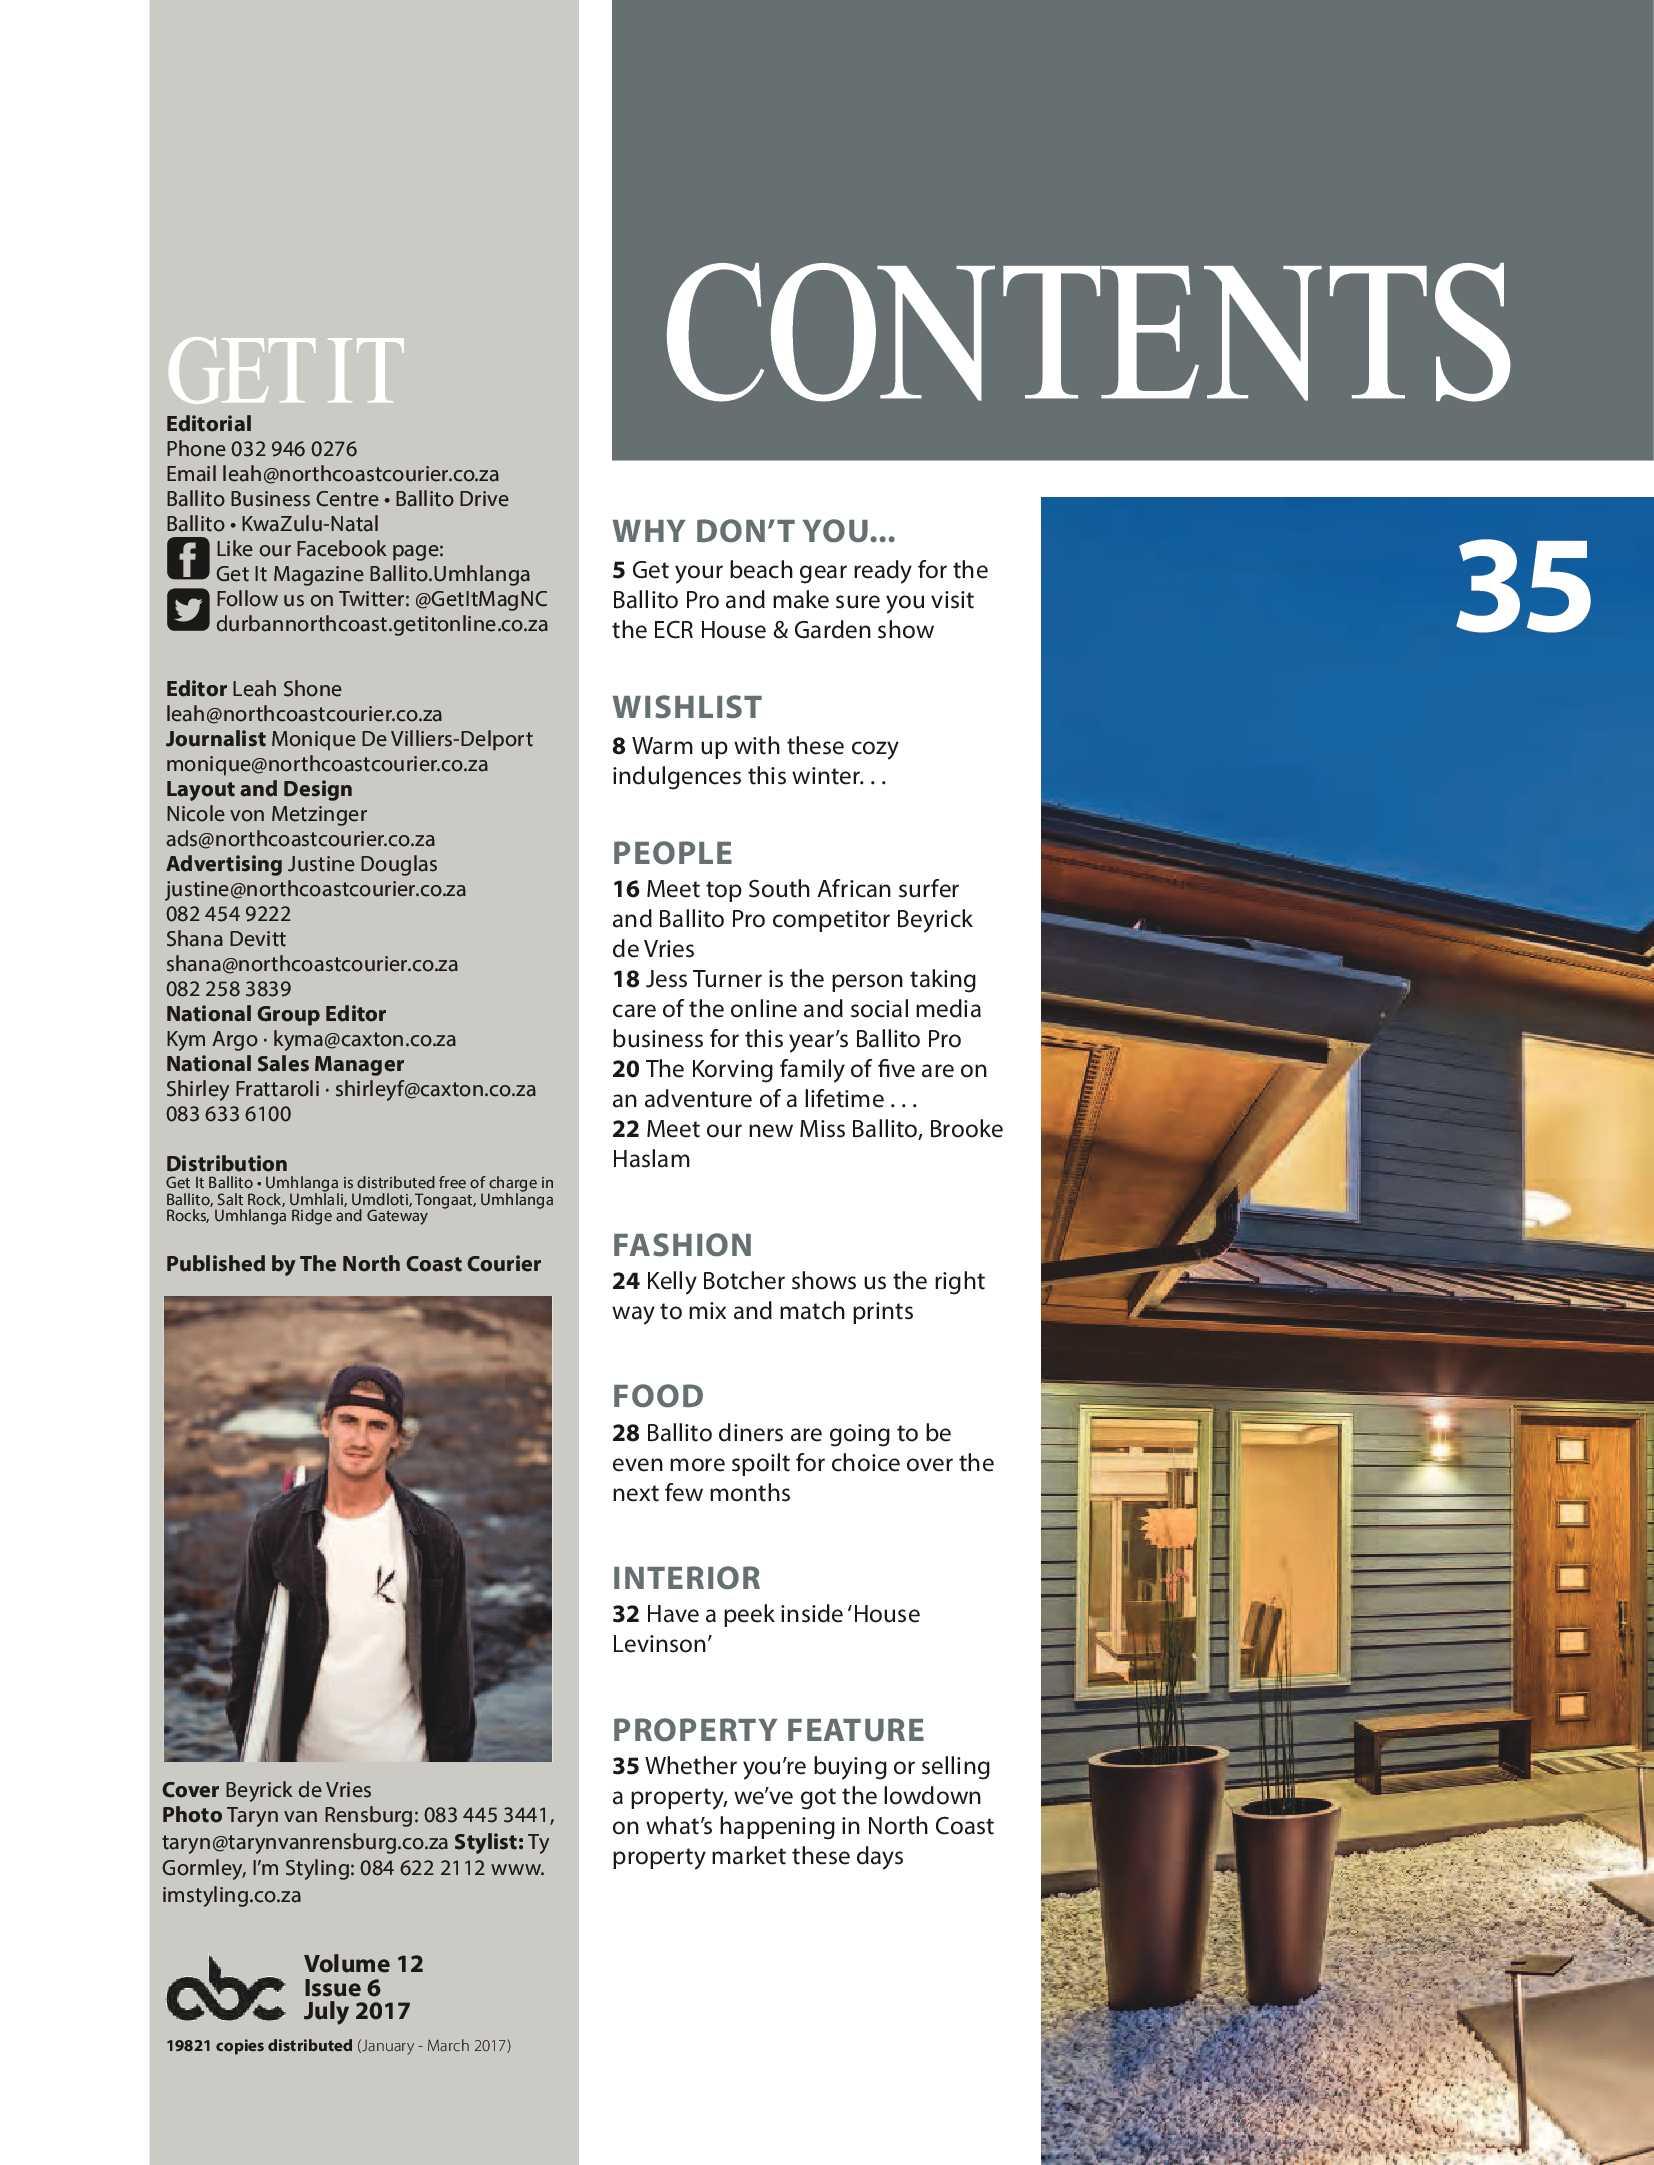 get-magazine-ballitoumhlanga-july-2017-2-epapers-page-5